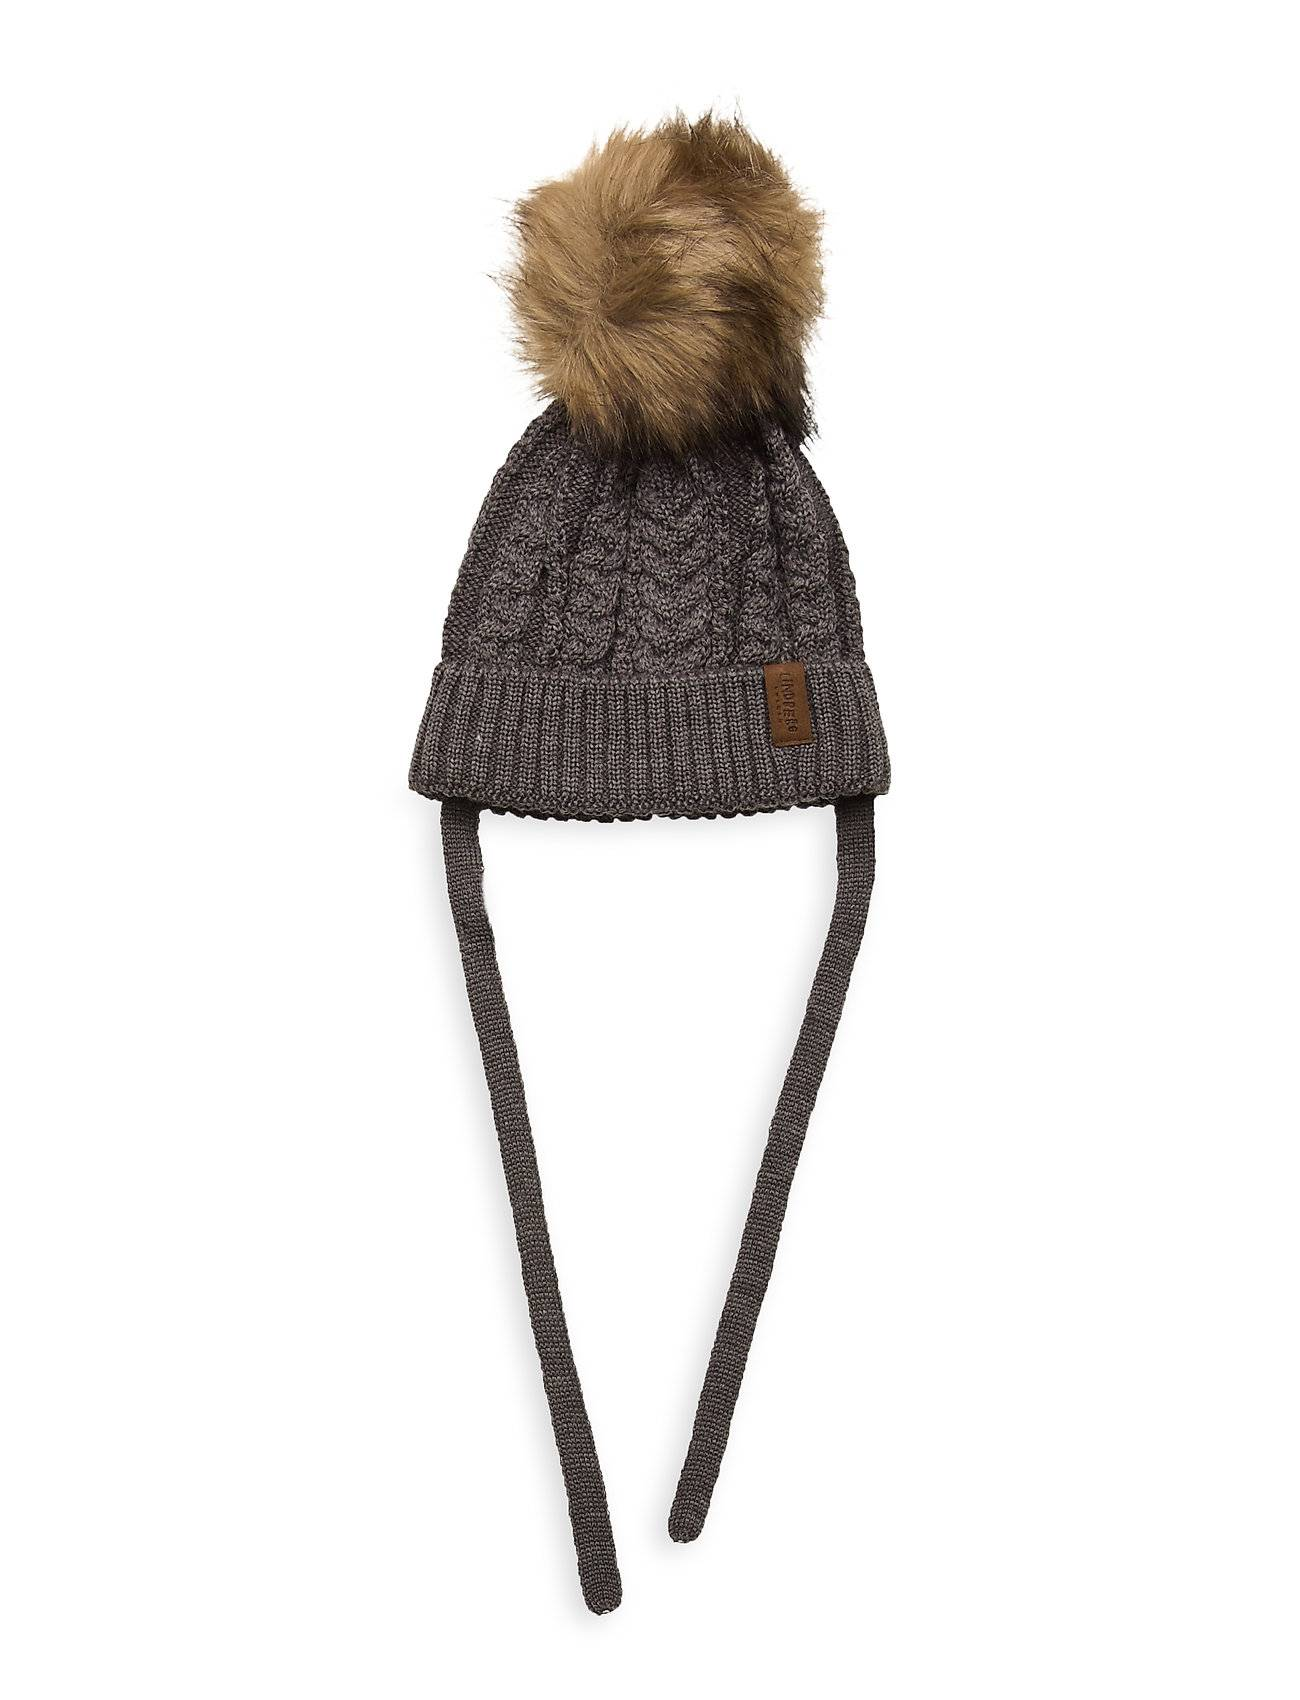 Lindberg Sweden Sunne Hat Accessories Headwear Hats Harmaa Lindberg Sweden